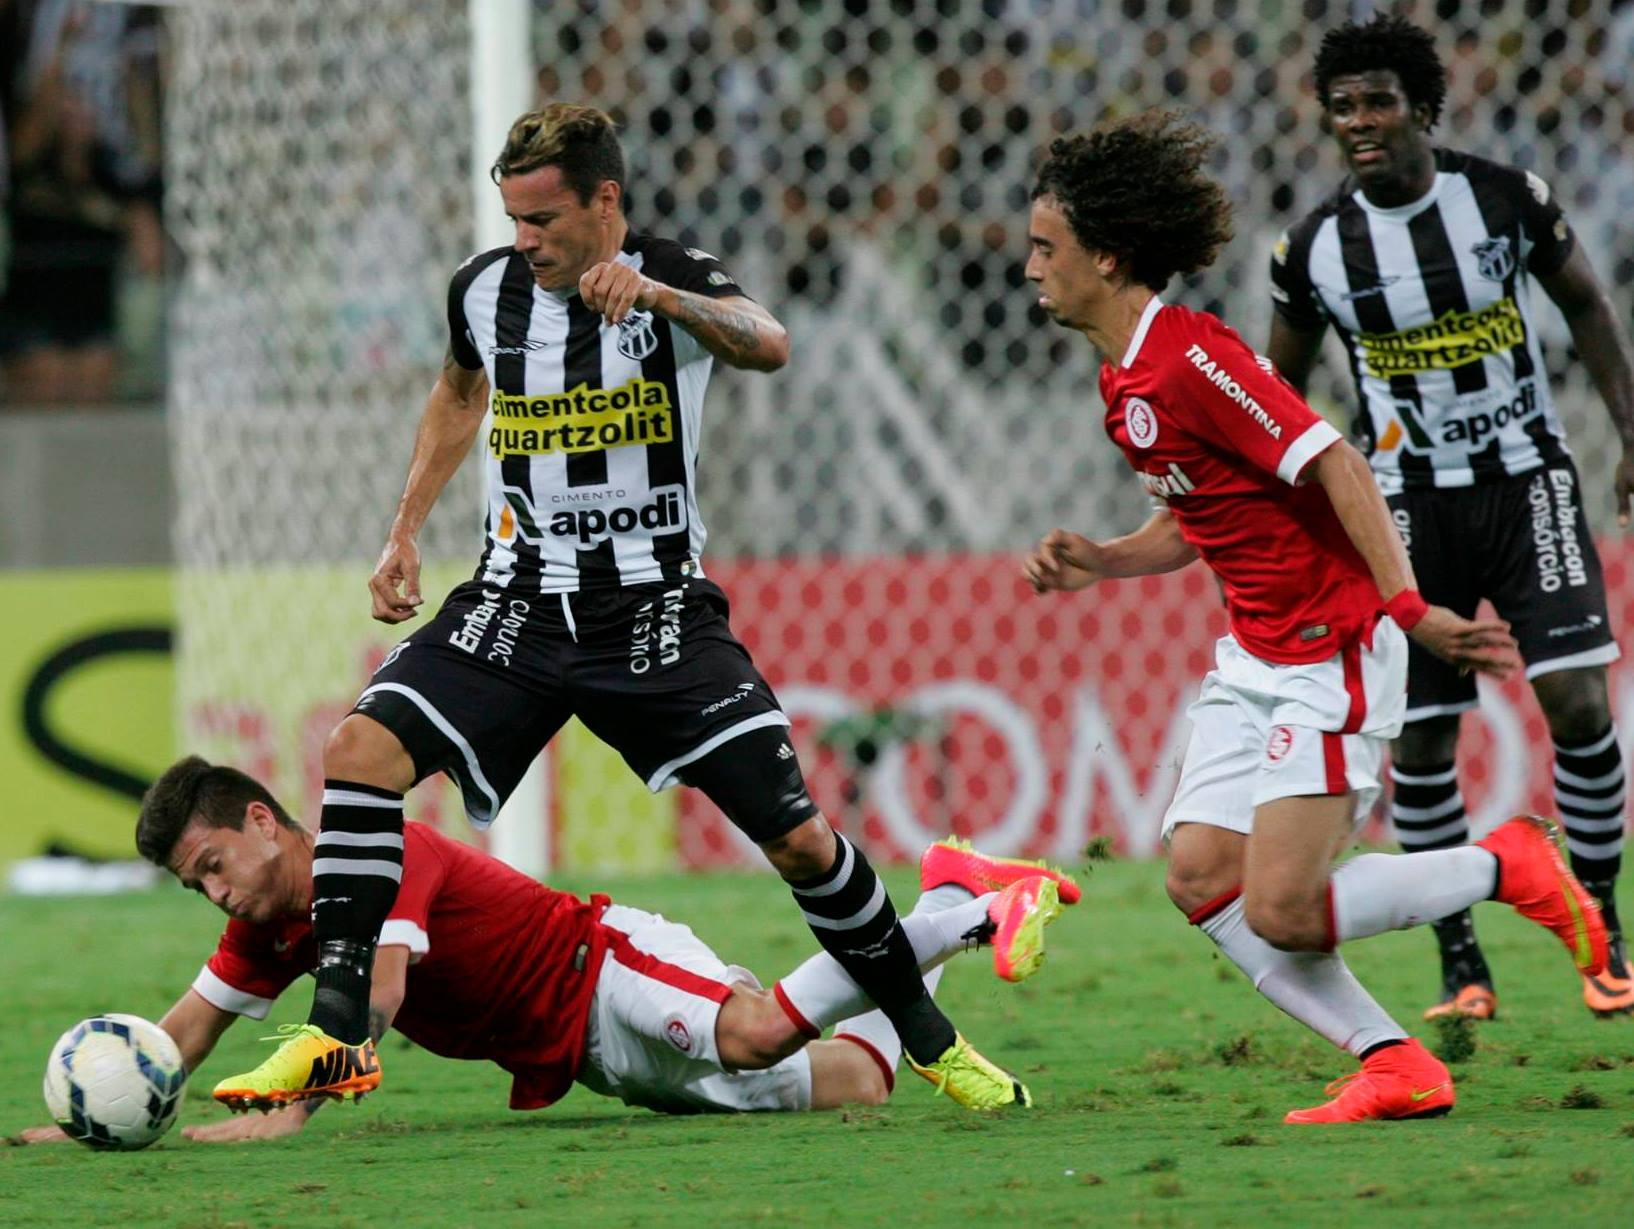 http://diariodonordeste.verdesmares.com.br/polopoly_fs/1.1081344!/image/image.jpg